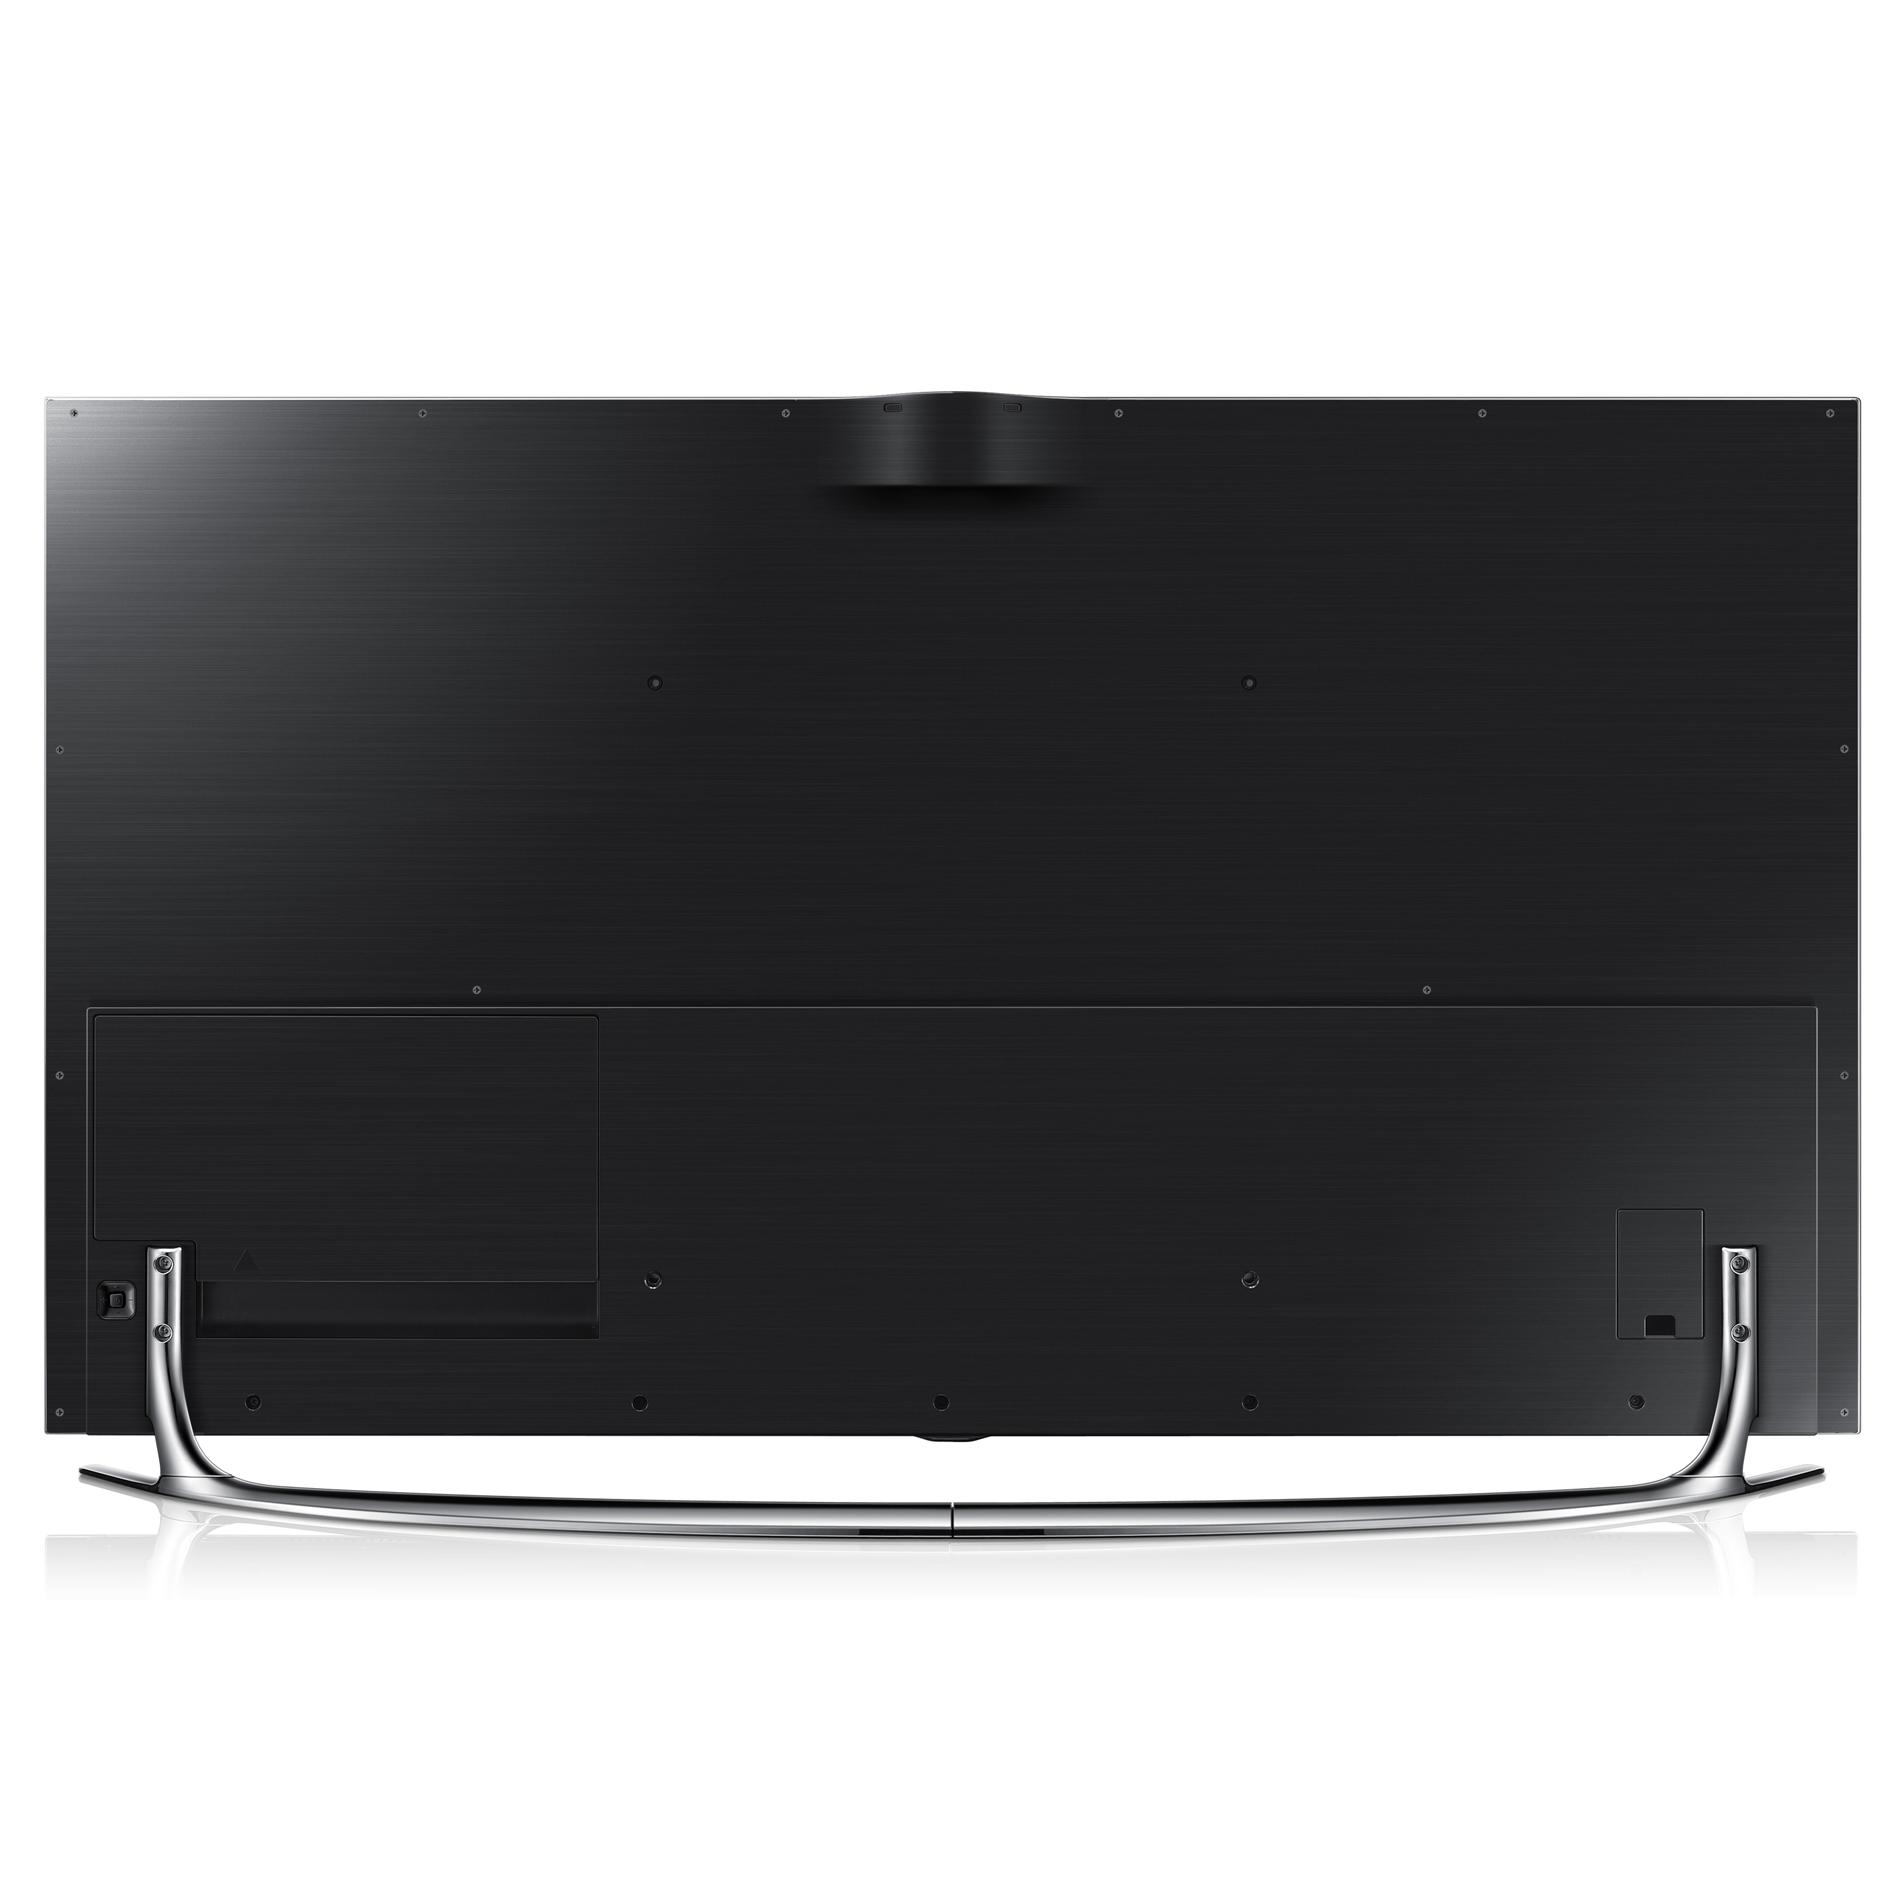 "Samsung 46"" Class 1080p 240Hz 3D LED HDTV - UN46F8000BFXZA"